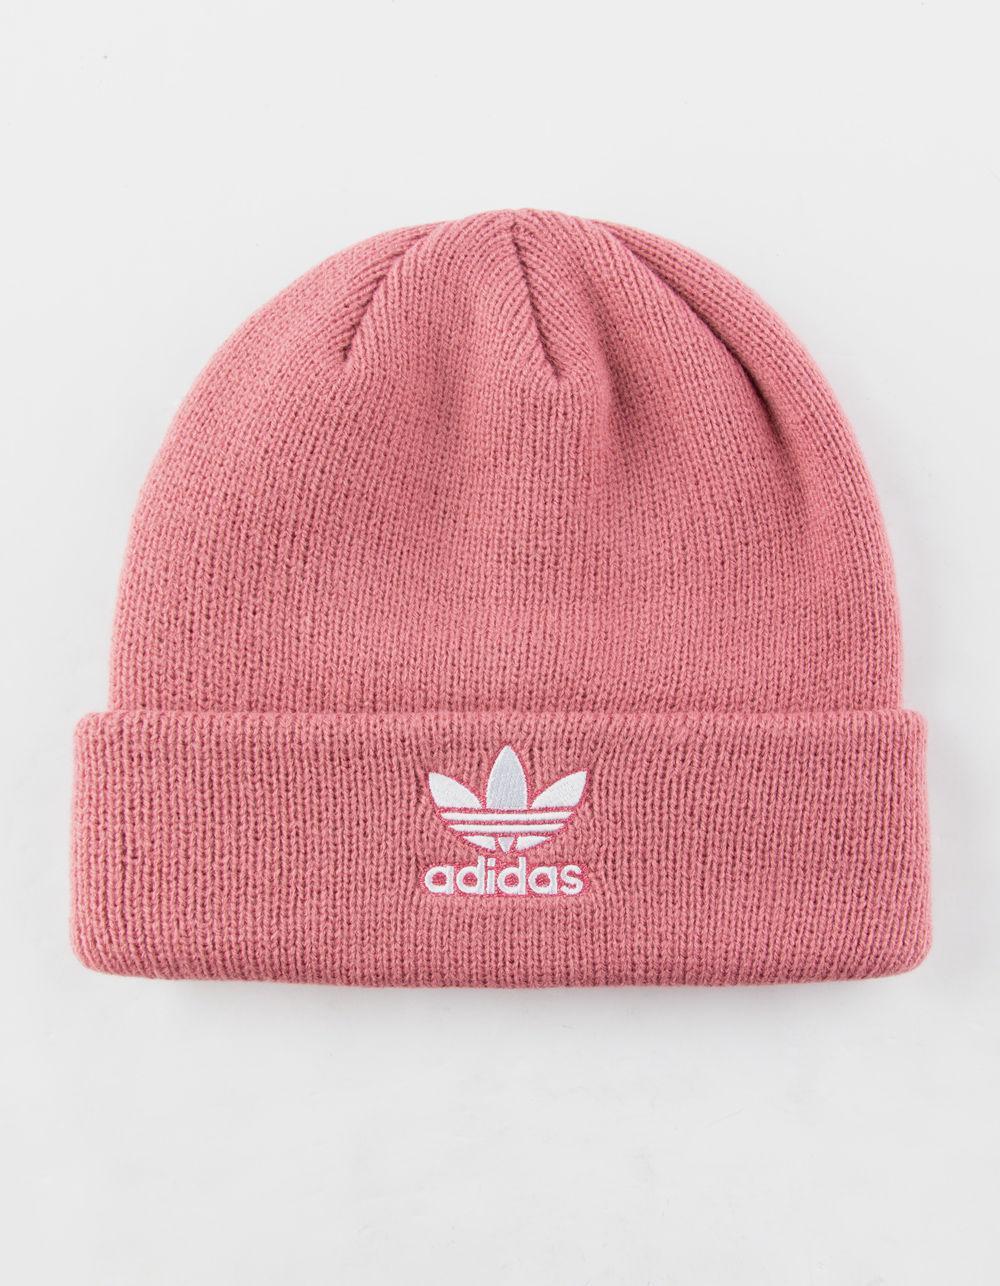 fbf24da9d34 ... Adidas - Originals Trefoil Pink Womens Beanie - Lyst. View fullscreen  adidas  Originals Trefoil II Knit ...